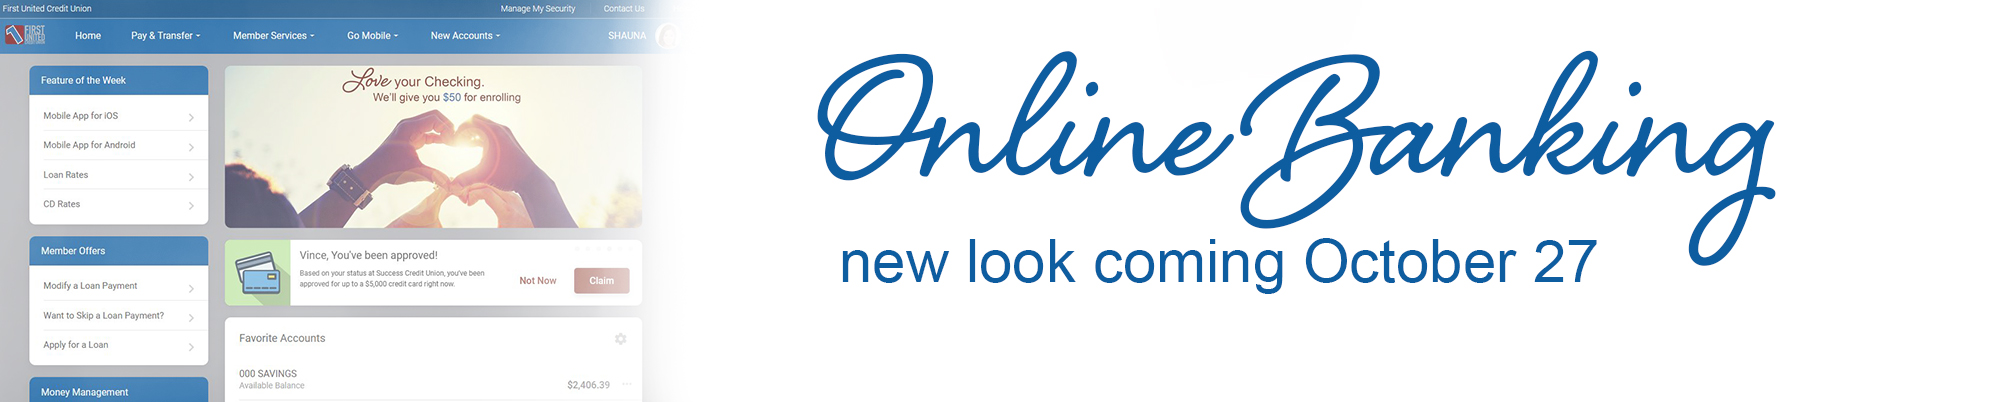 Online Banking New Look